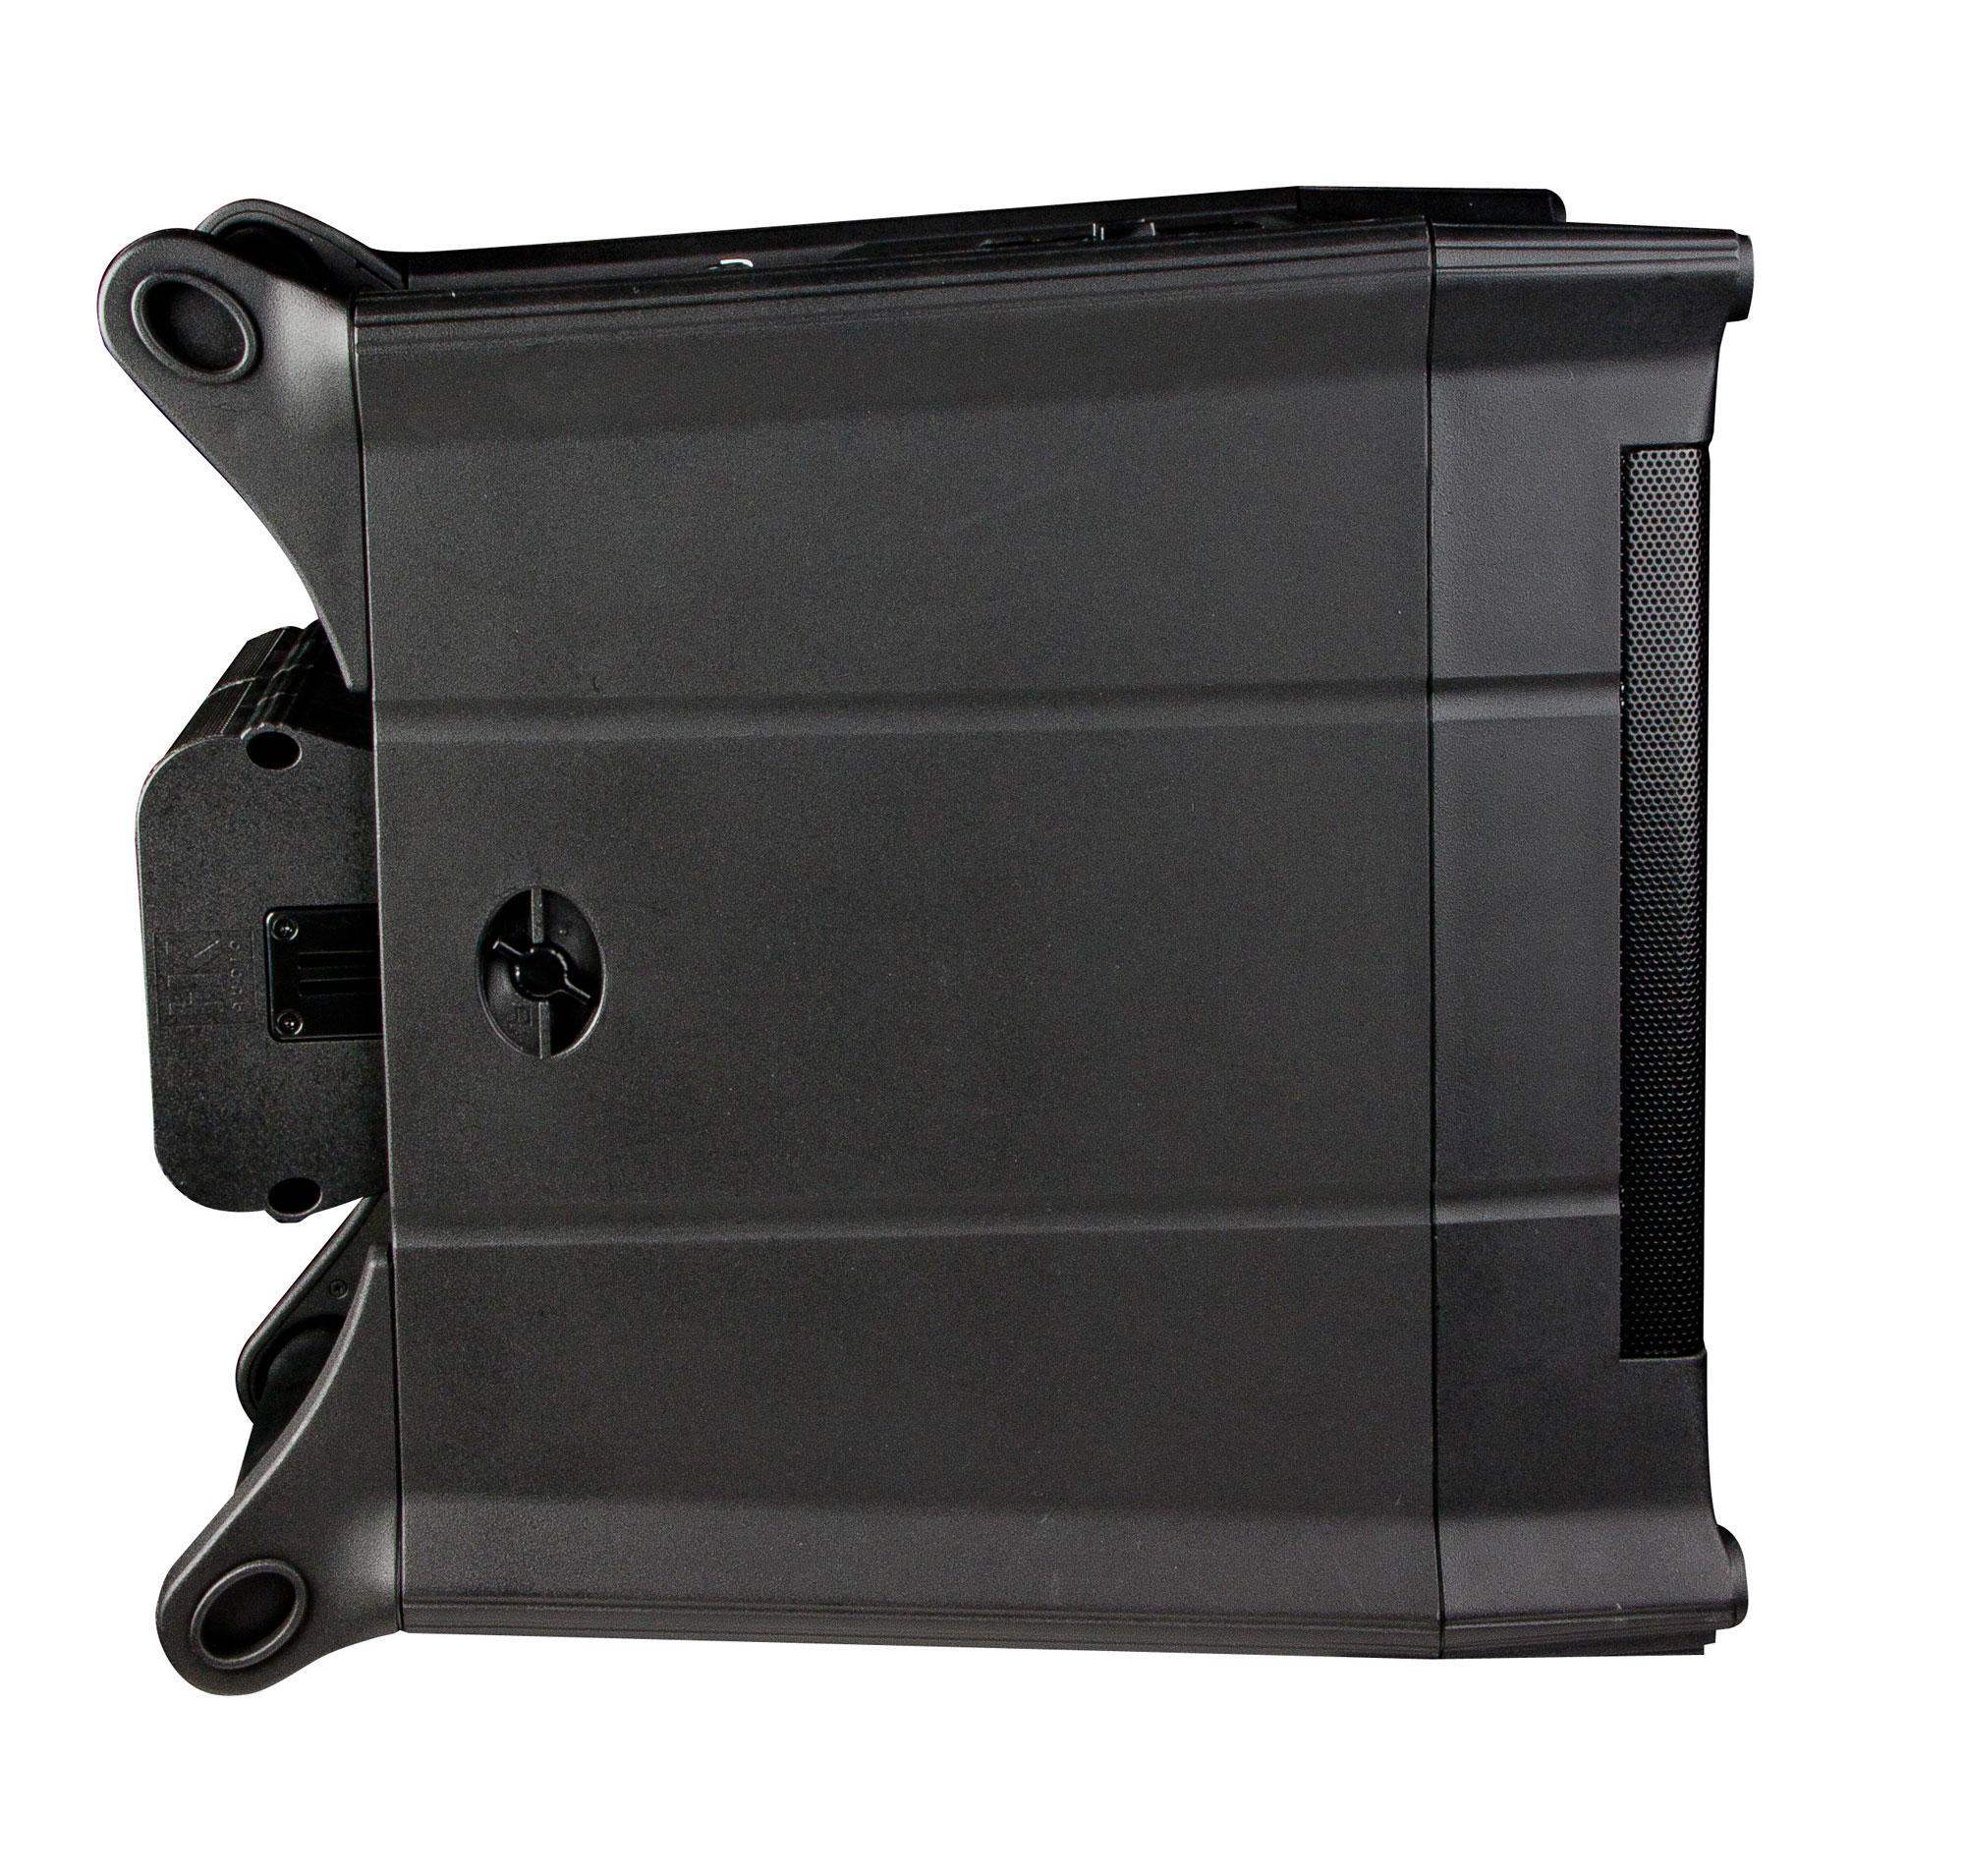 hk audio lucas nano 300 komplett set. Black Bedroom Furniture Sets. Home Design Ideas